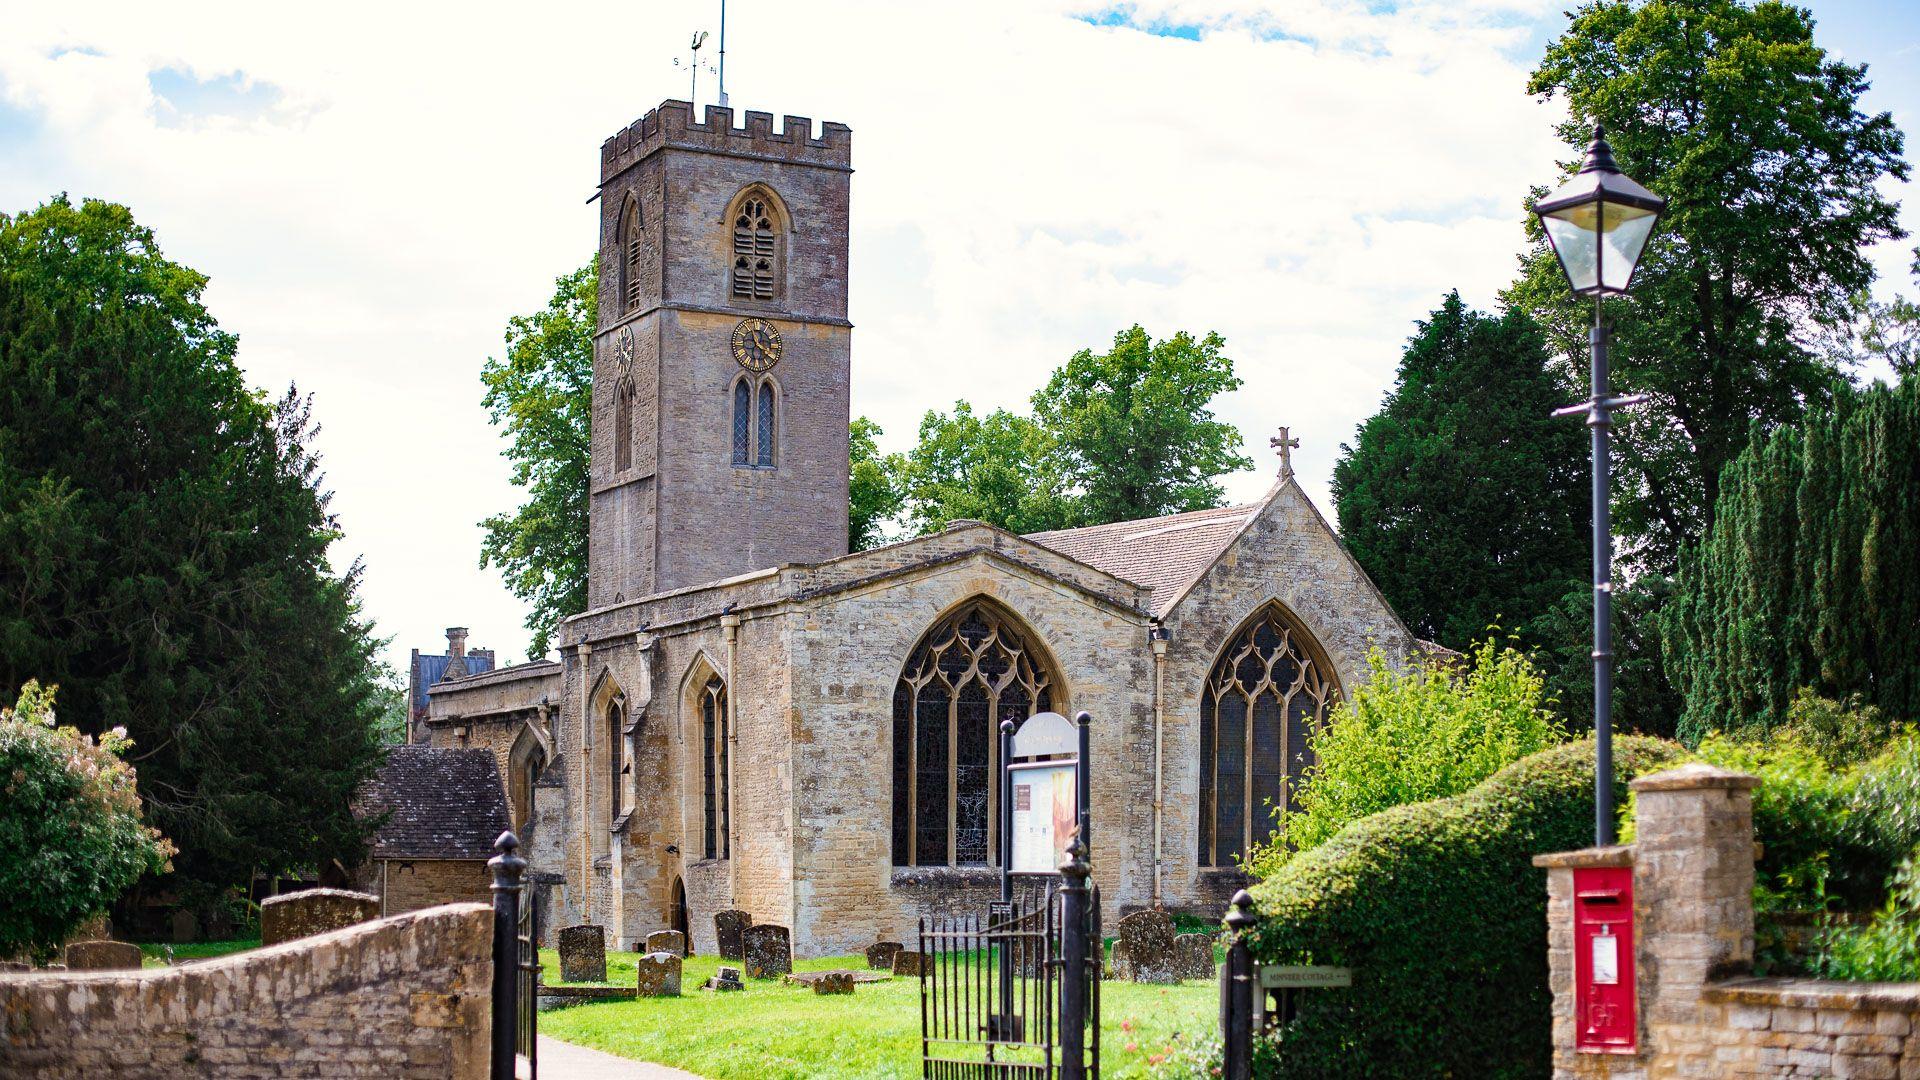 St Mary's Church, Charlbury